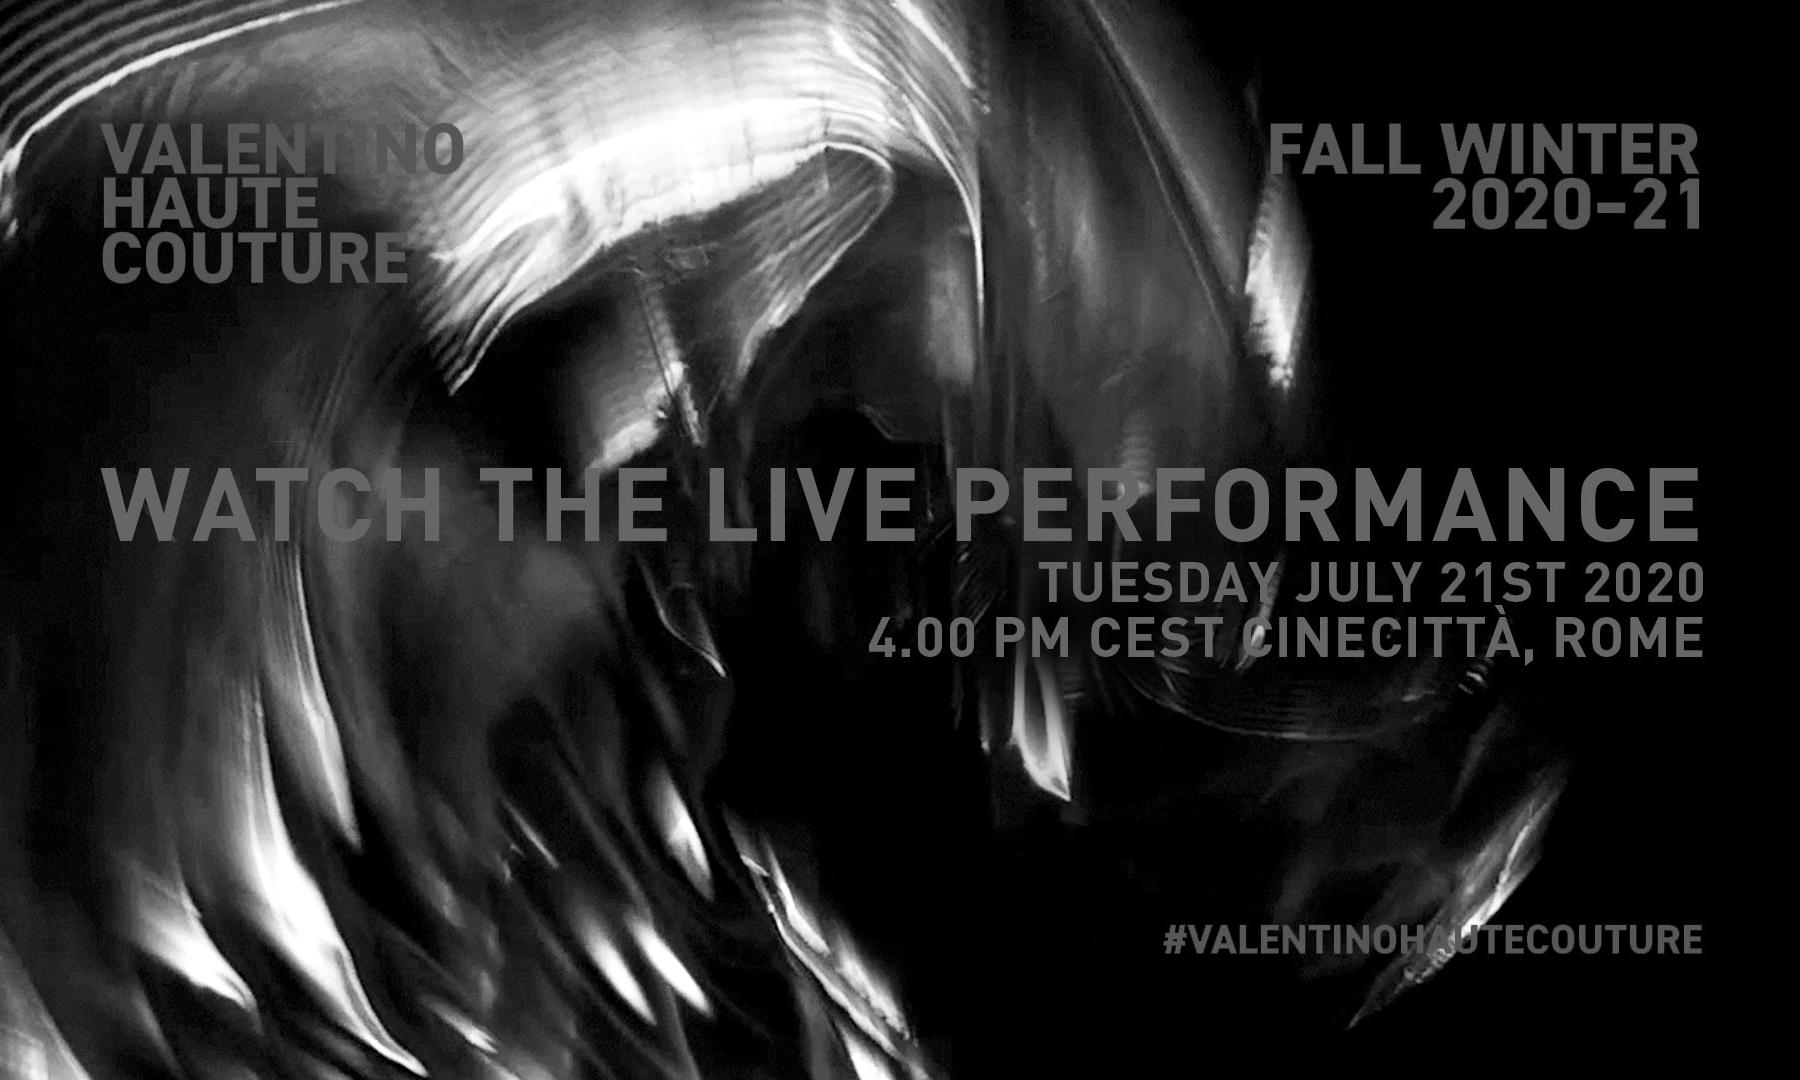 Valentino 秋冬高定大秀将于今晚直播上线